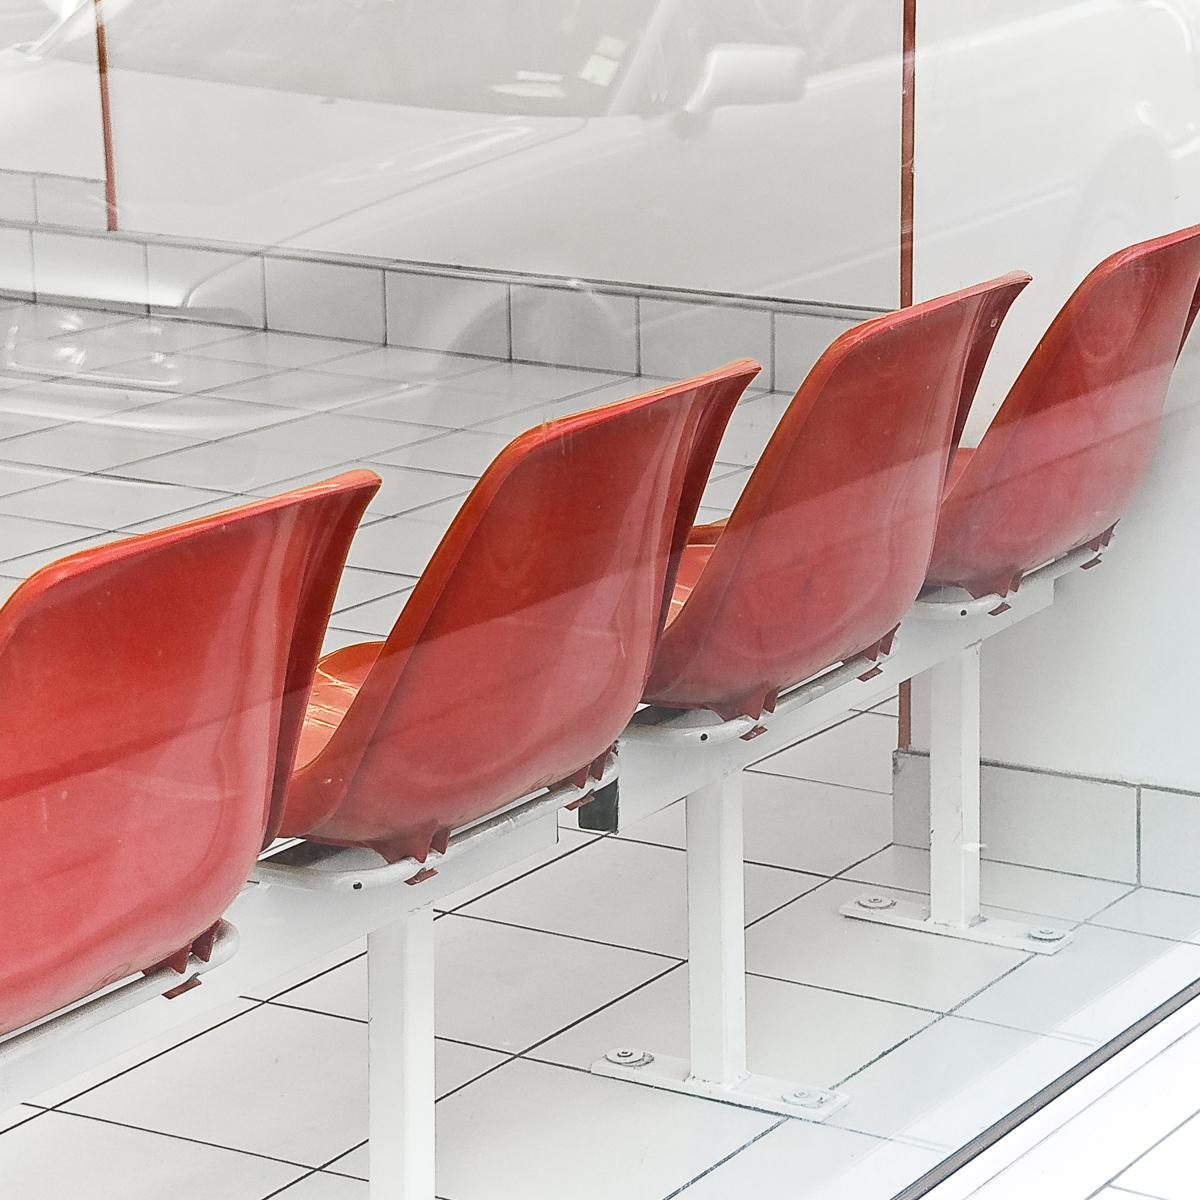 laundromat_red_seats_-1.jpg